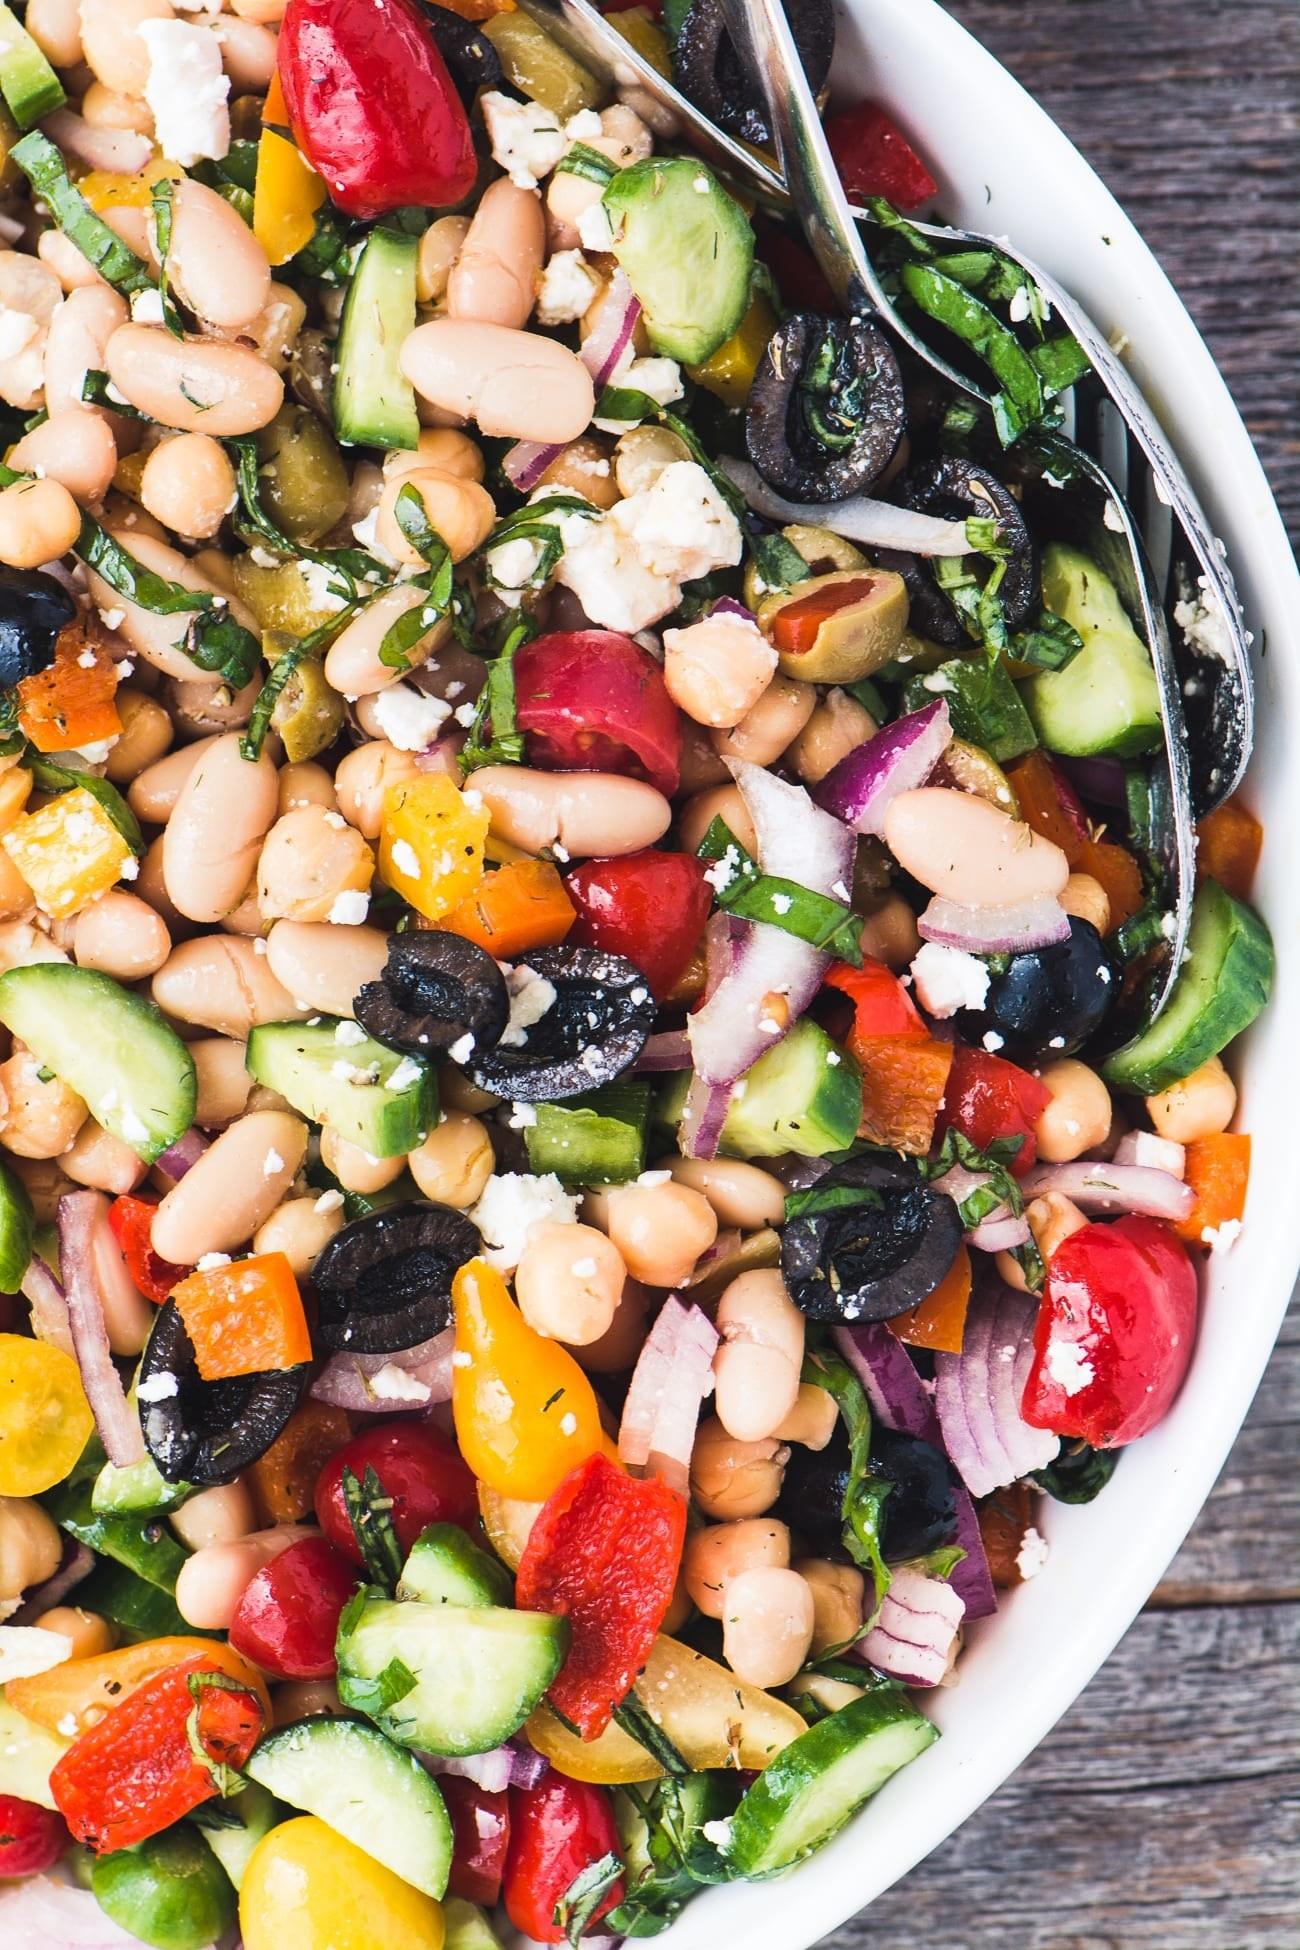 The bowl of bean salad